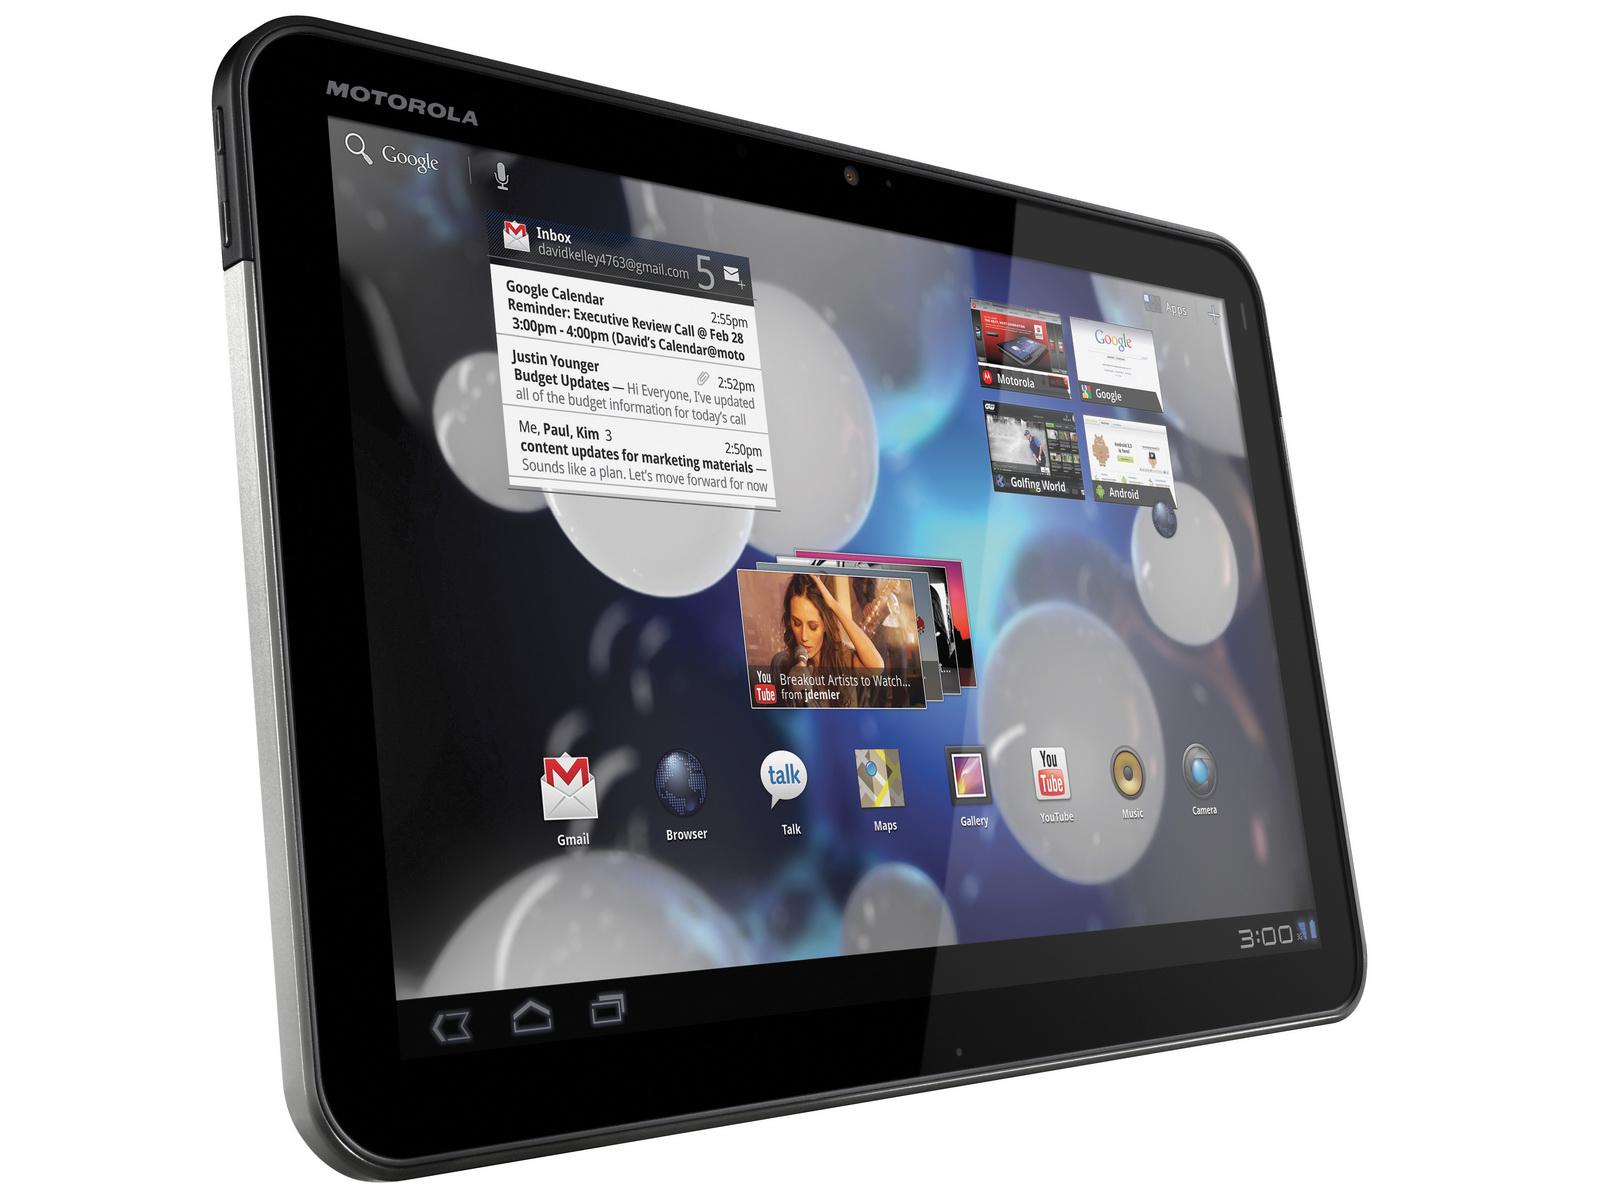 Geek Test: Motorola Xoom MZ604 Tablet